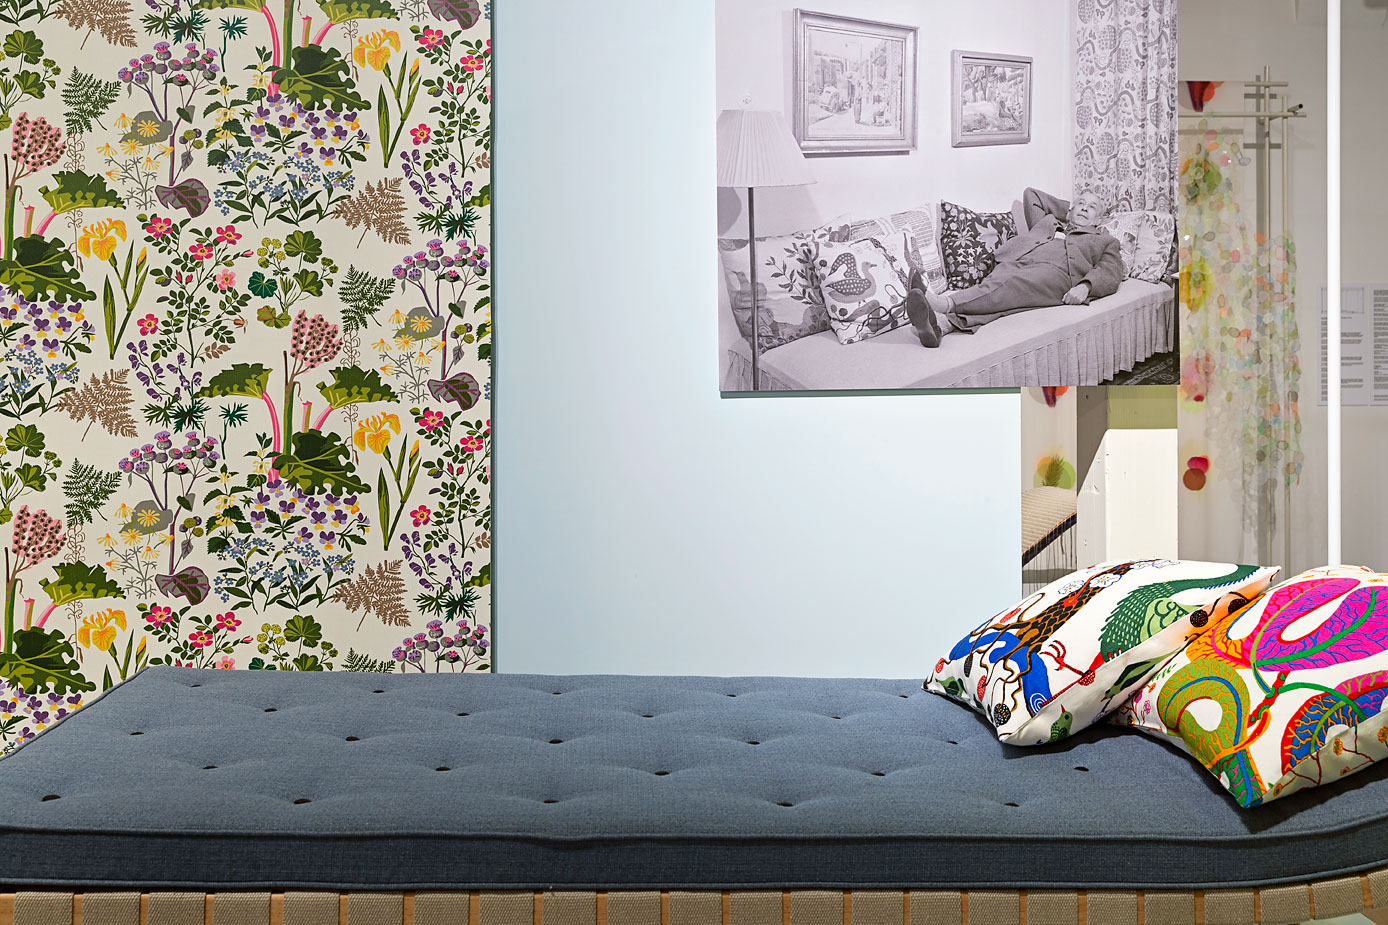 Foto: Josefina Eikenaar / TextielMuseum. 'Simply Scandinavian' by Scholten & Baijings